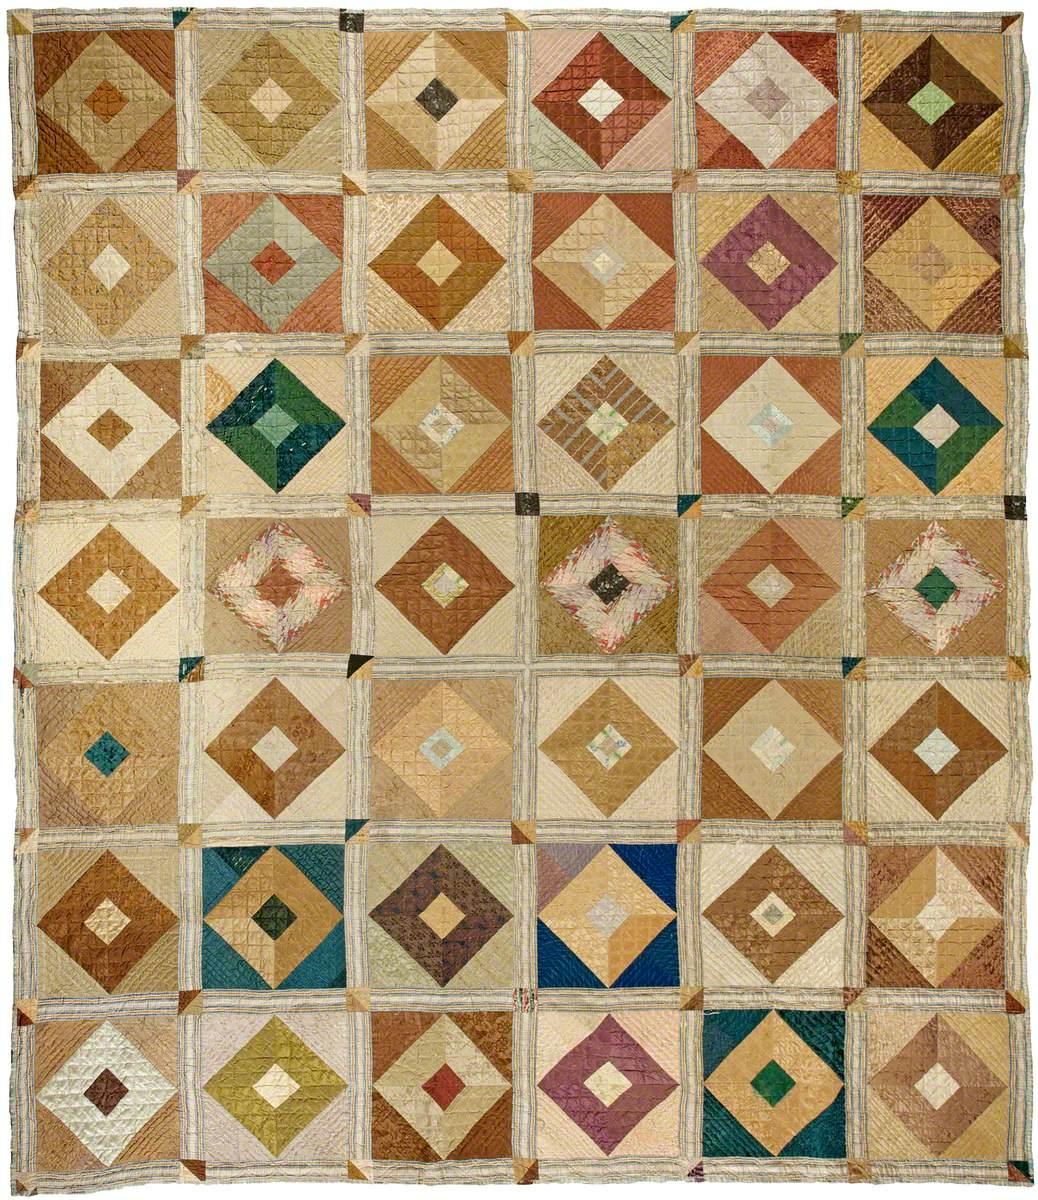 Quaker Square-in-a-Square Quilt